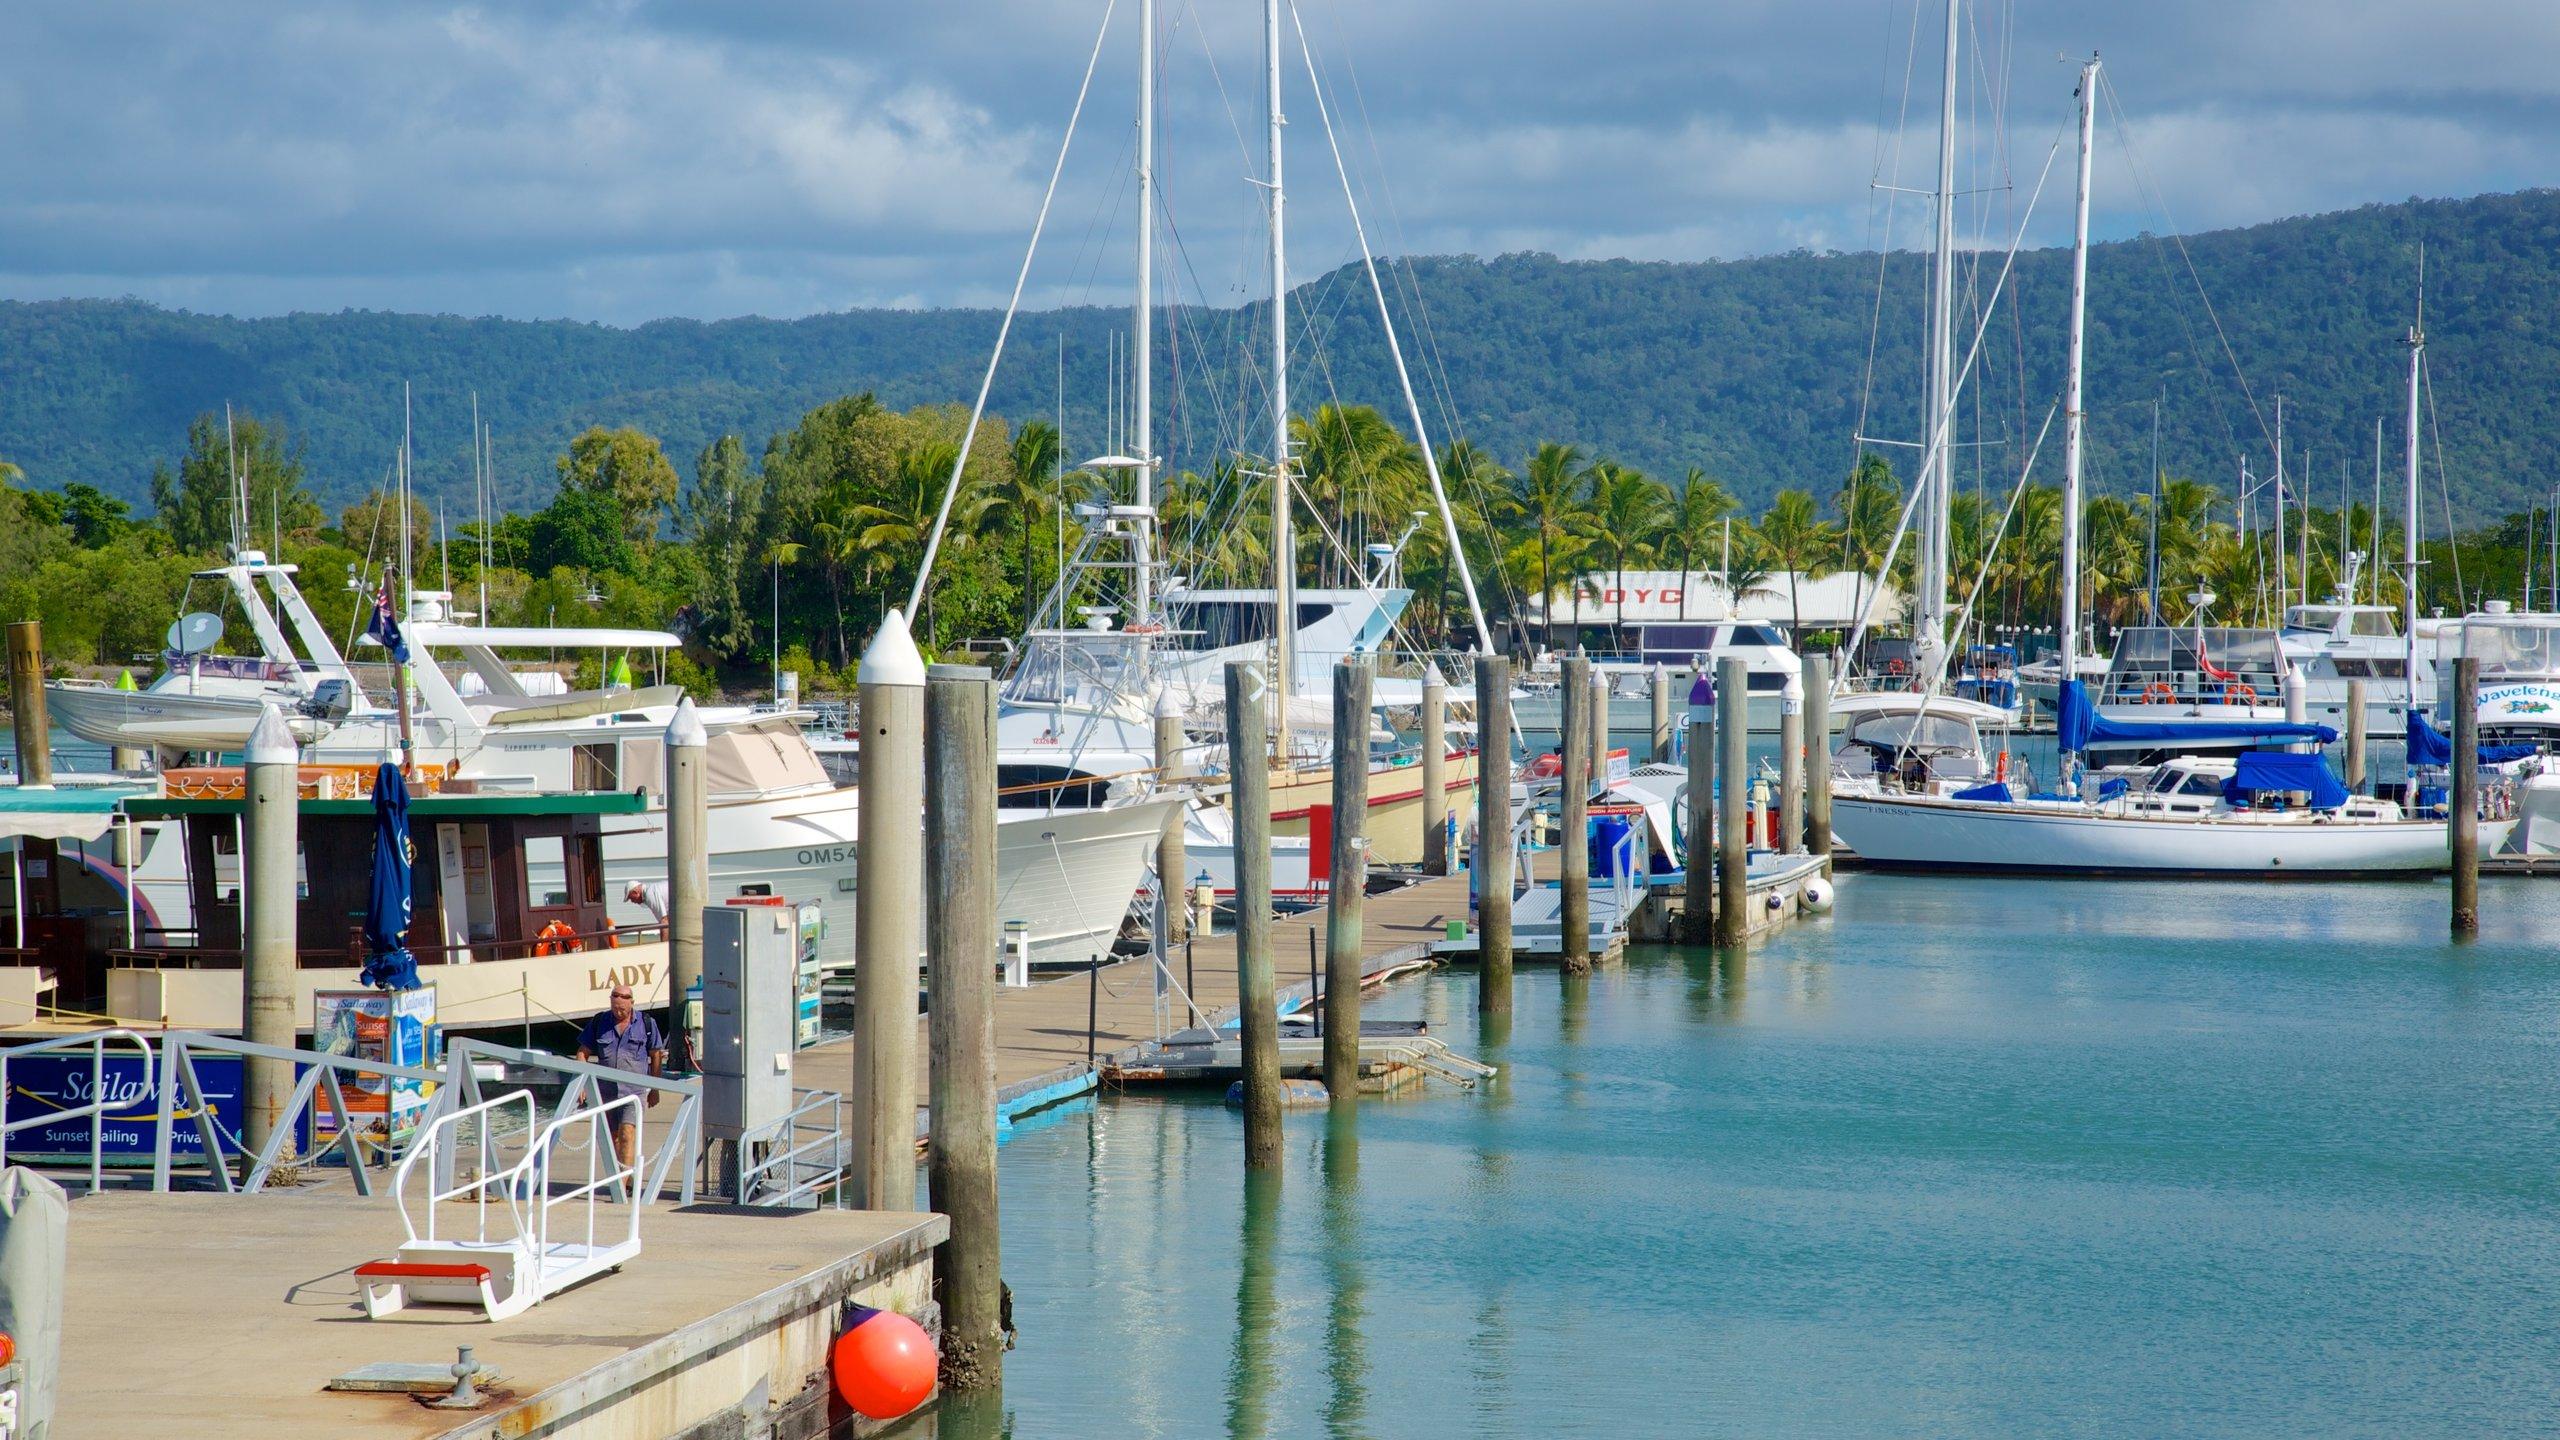 Crystalbrook Superyacht Marina, Port Douglas, Queensland, Australia